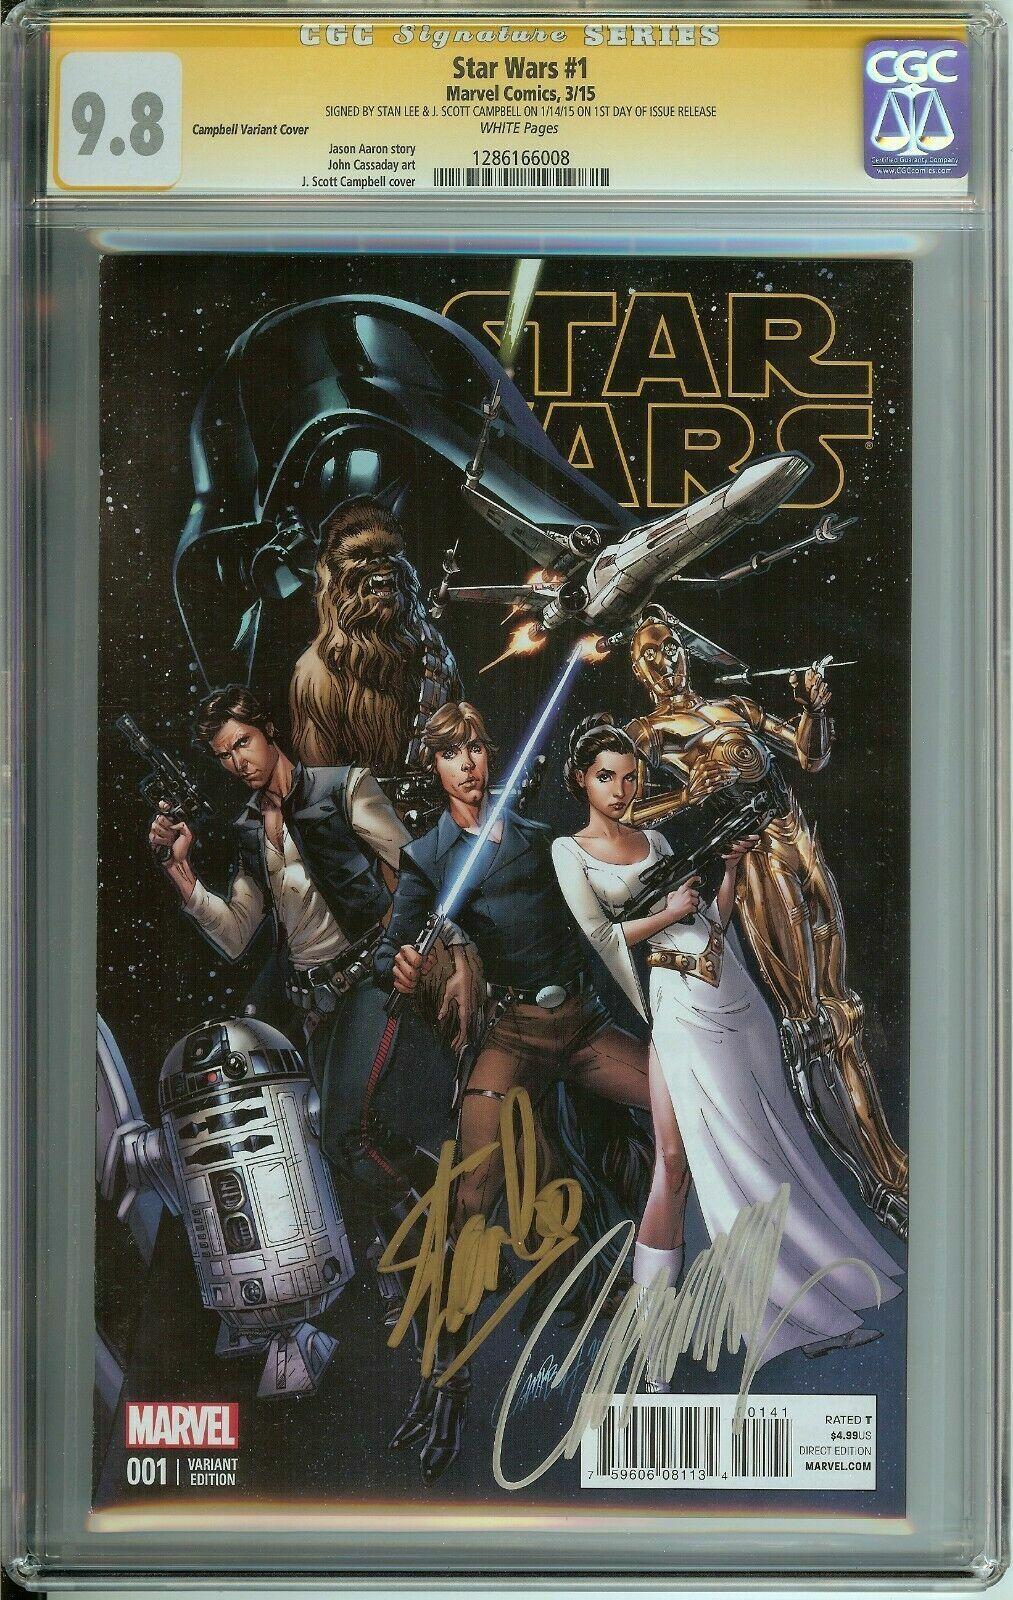 Signé par Stan  Lee Scott Campbell SS Star Wars  1 CGC 9.8 Pages Blanches variante  meilleure mode